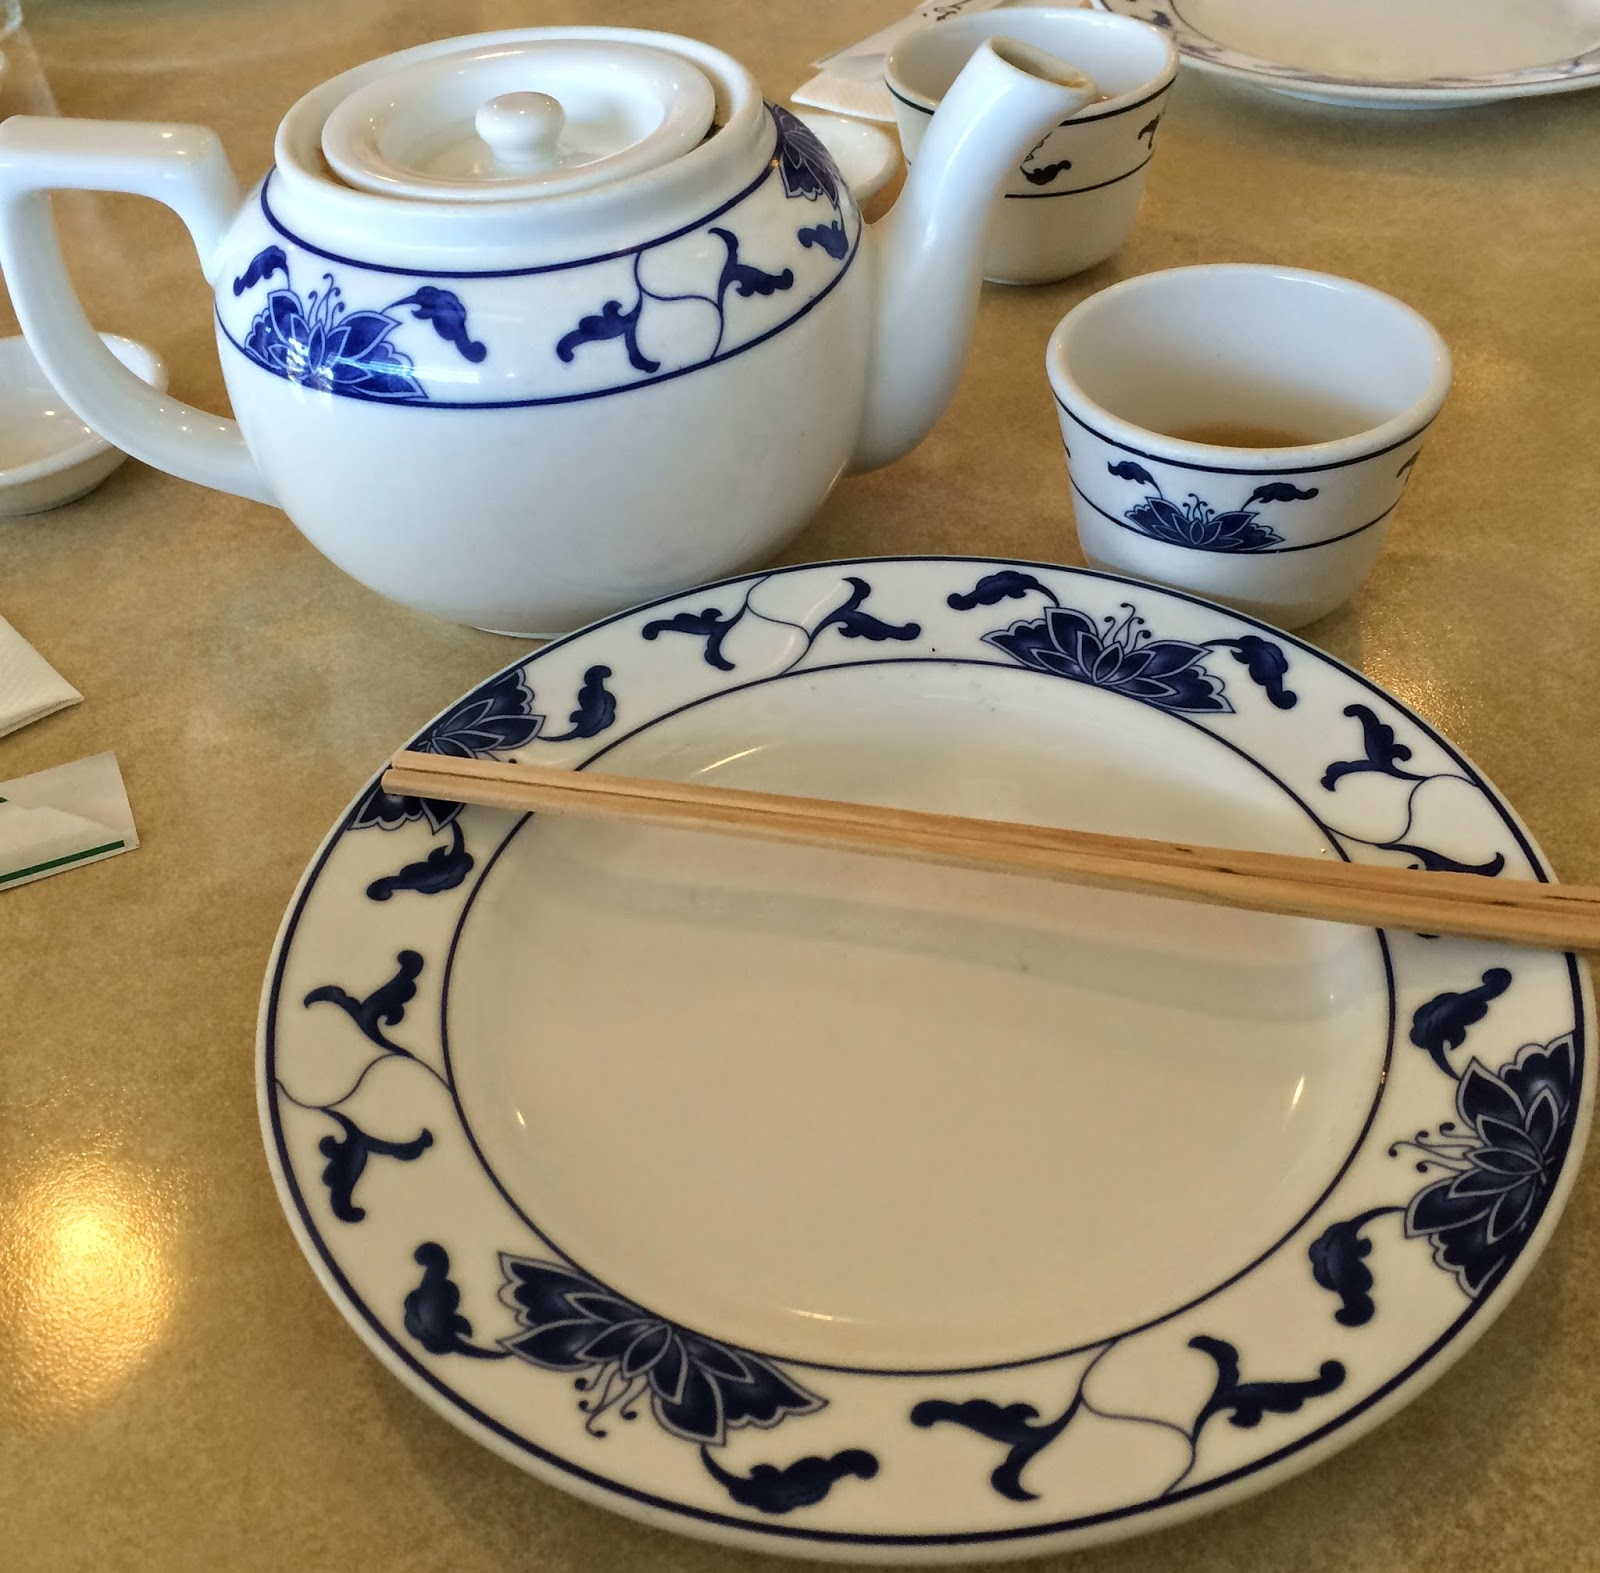 A LITTLE HOT TEA TO START OUR MEAL & TASTE OF HAWAII: AINA HAINA CHOP SUEY